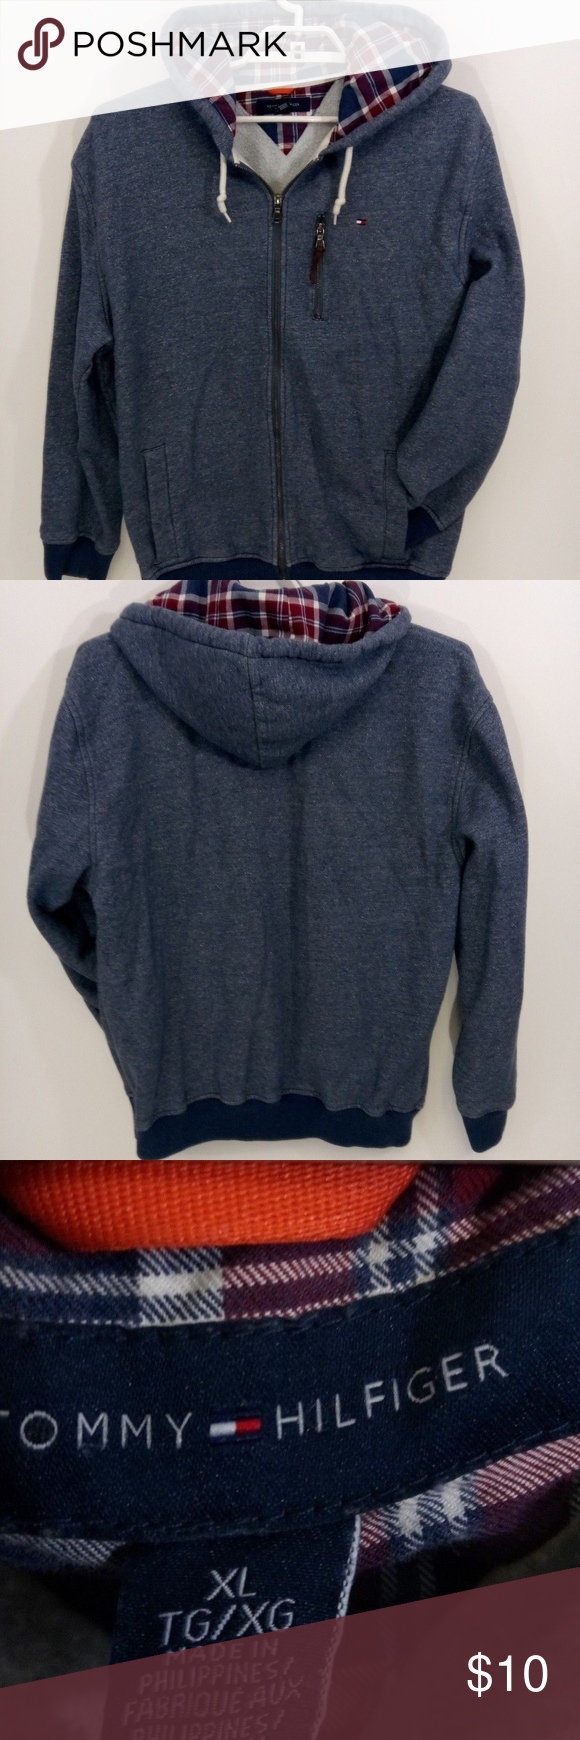 Tommy Hilfiger Blue Hooded Full Zip Jacket Size XL Zip